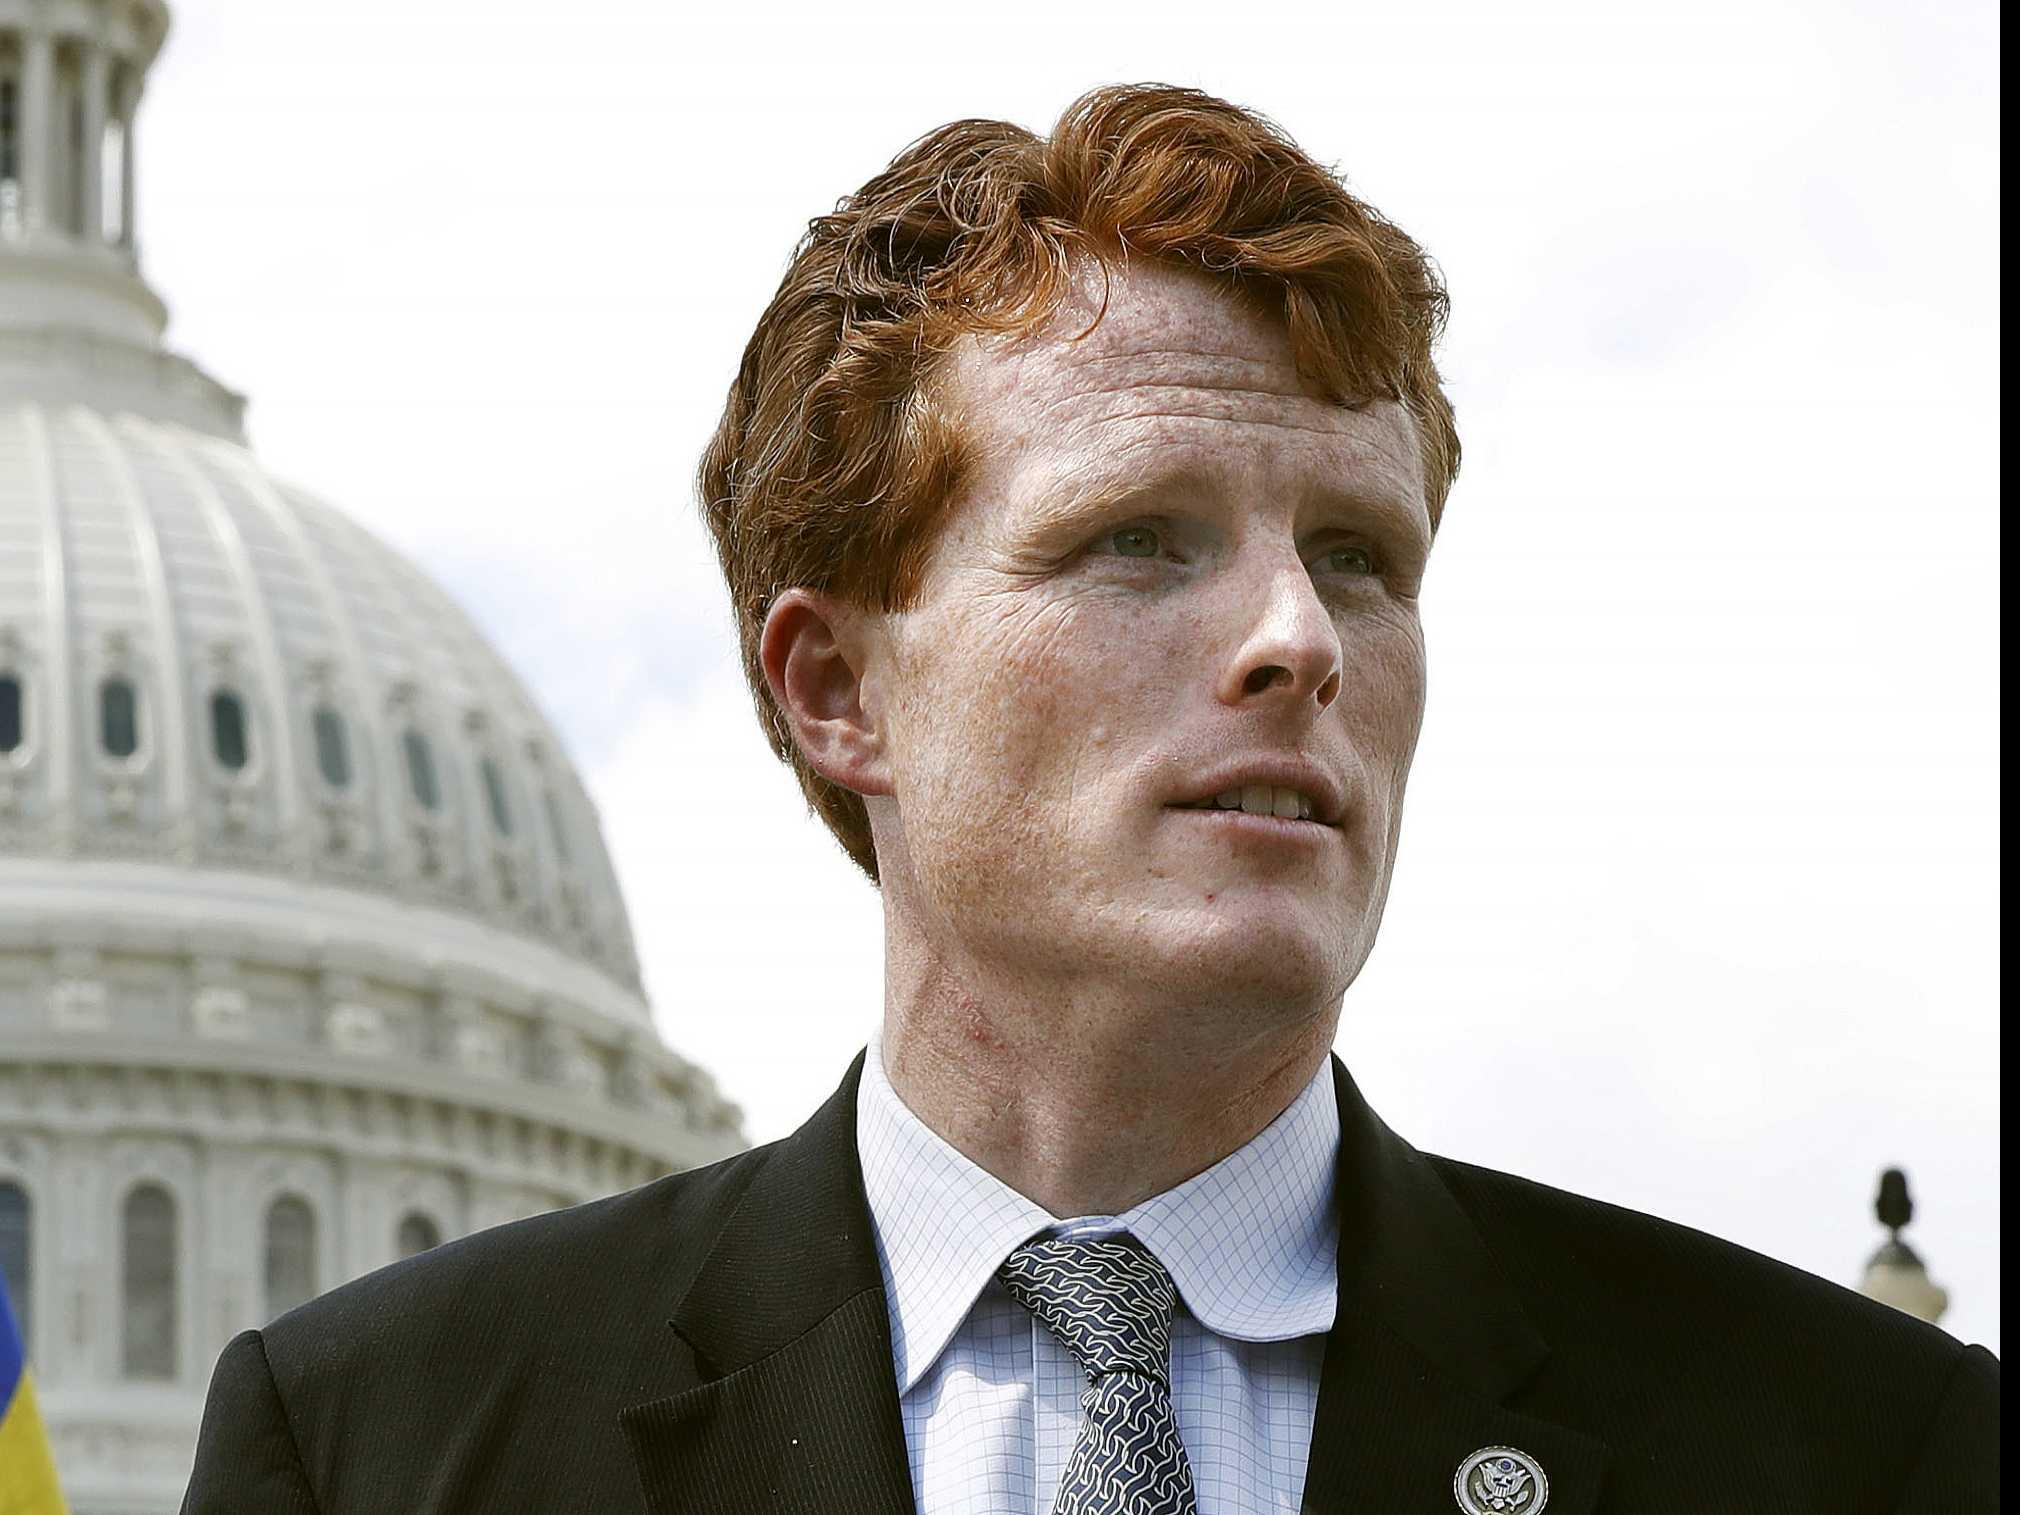 U.S. Rep. Kennedy: Democrats Should Embrace 'Moral Capitalism'